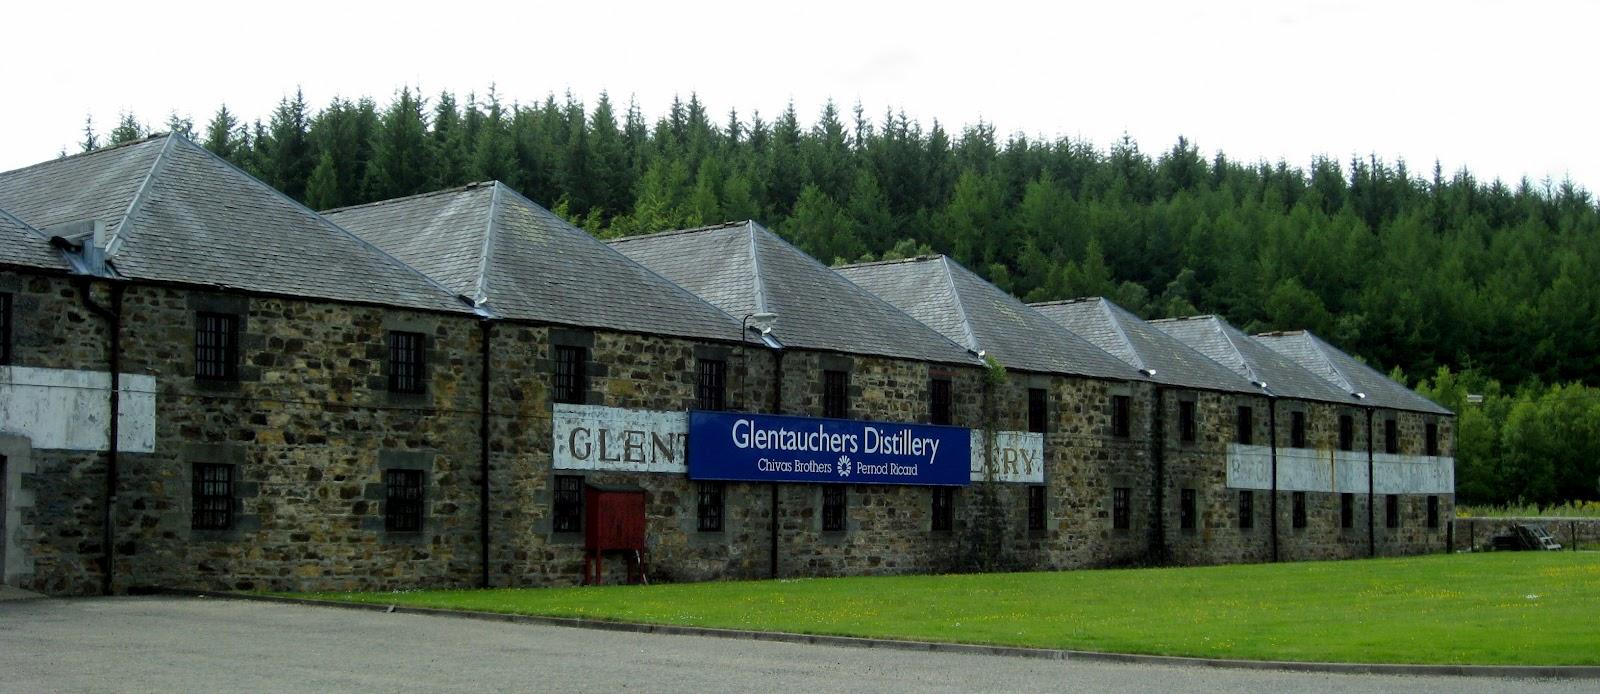 glentauchers-distilery